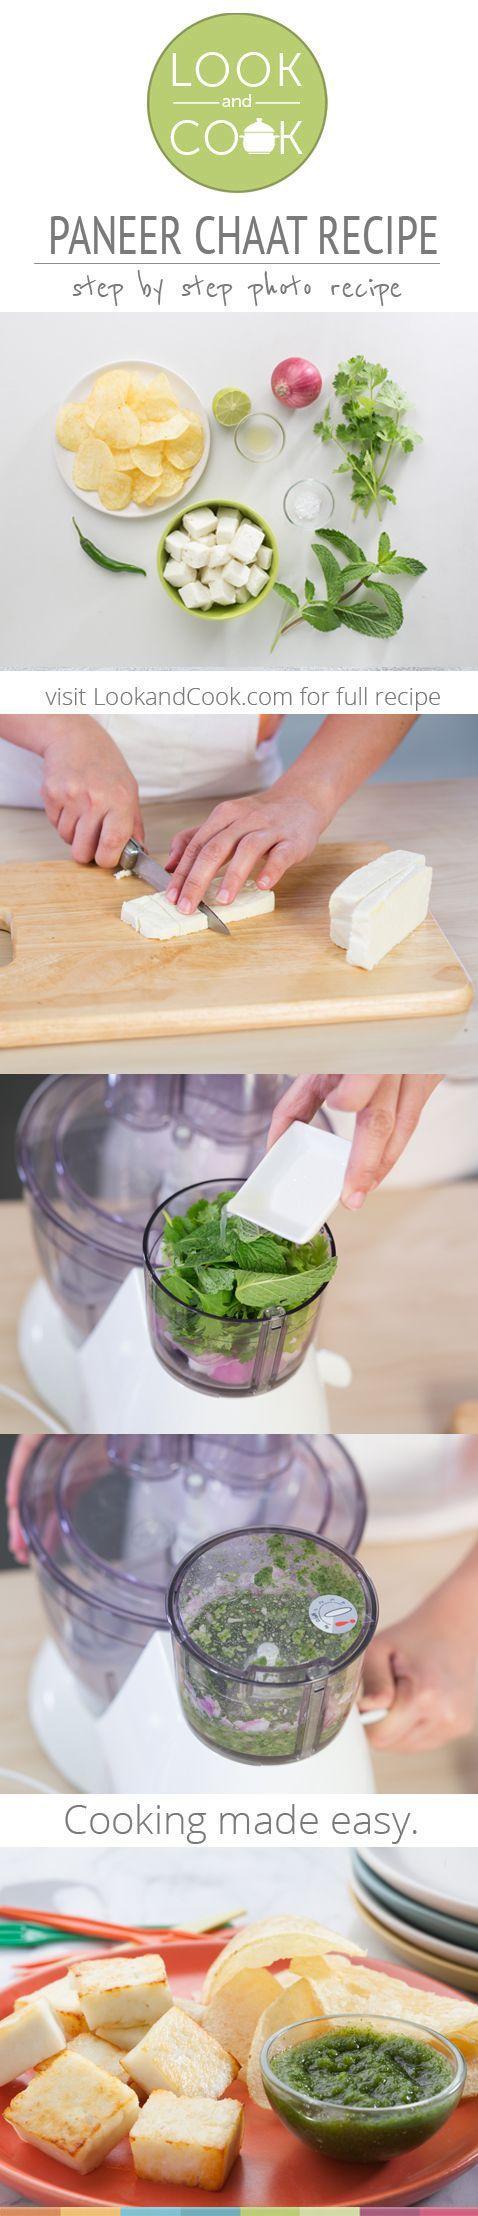 PANEER CHAAT RECIPE Paneer Chaat Recipe (#LC14135): Get step by step photo recipe at lookandcook.com